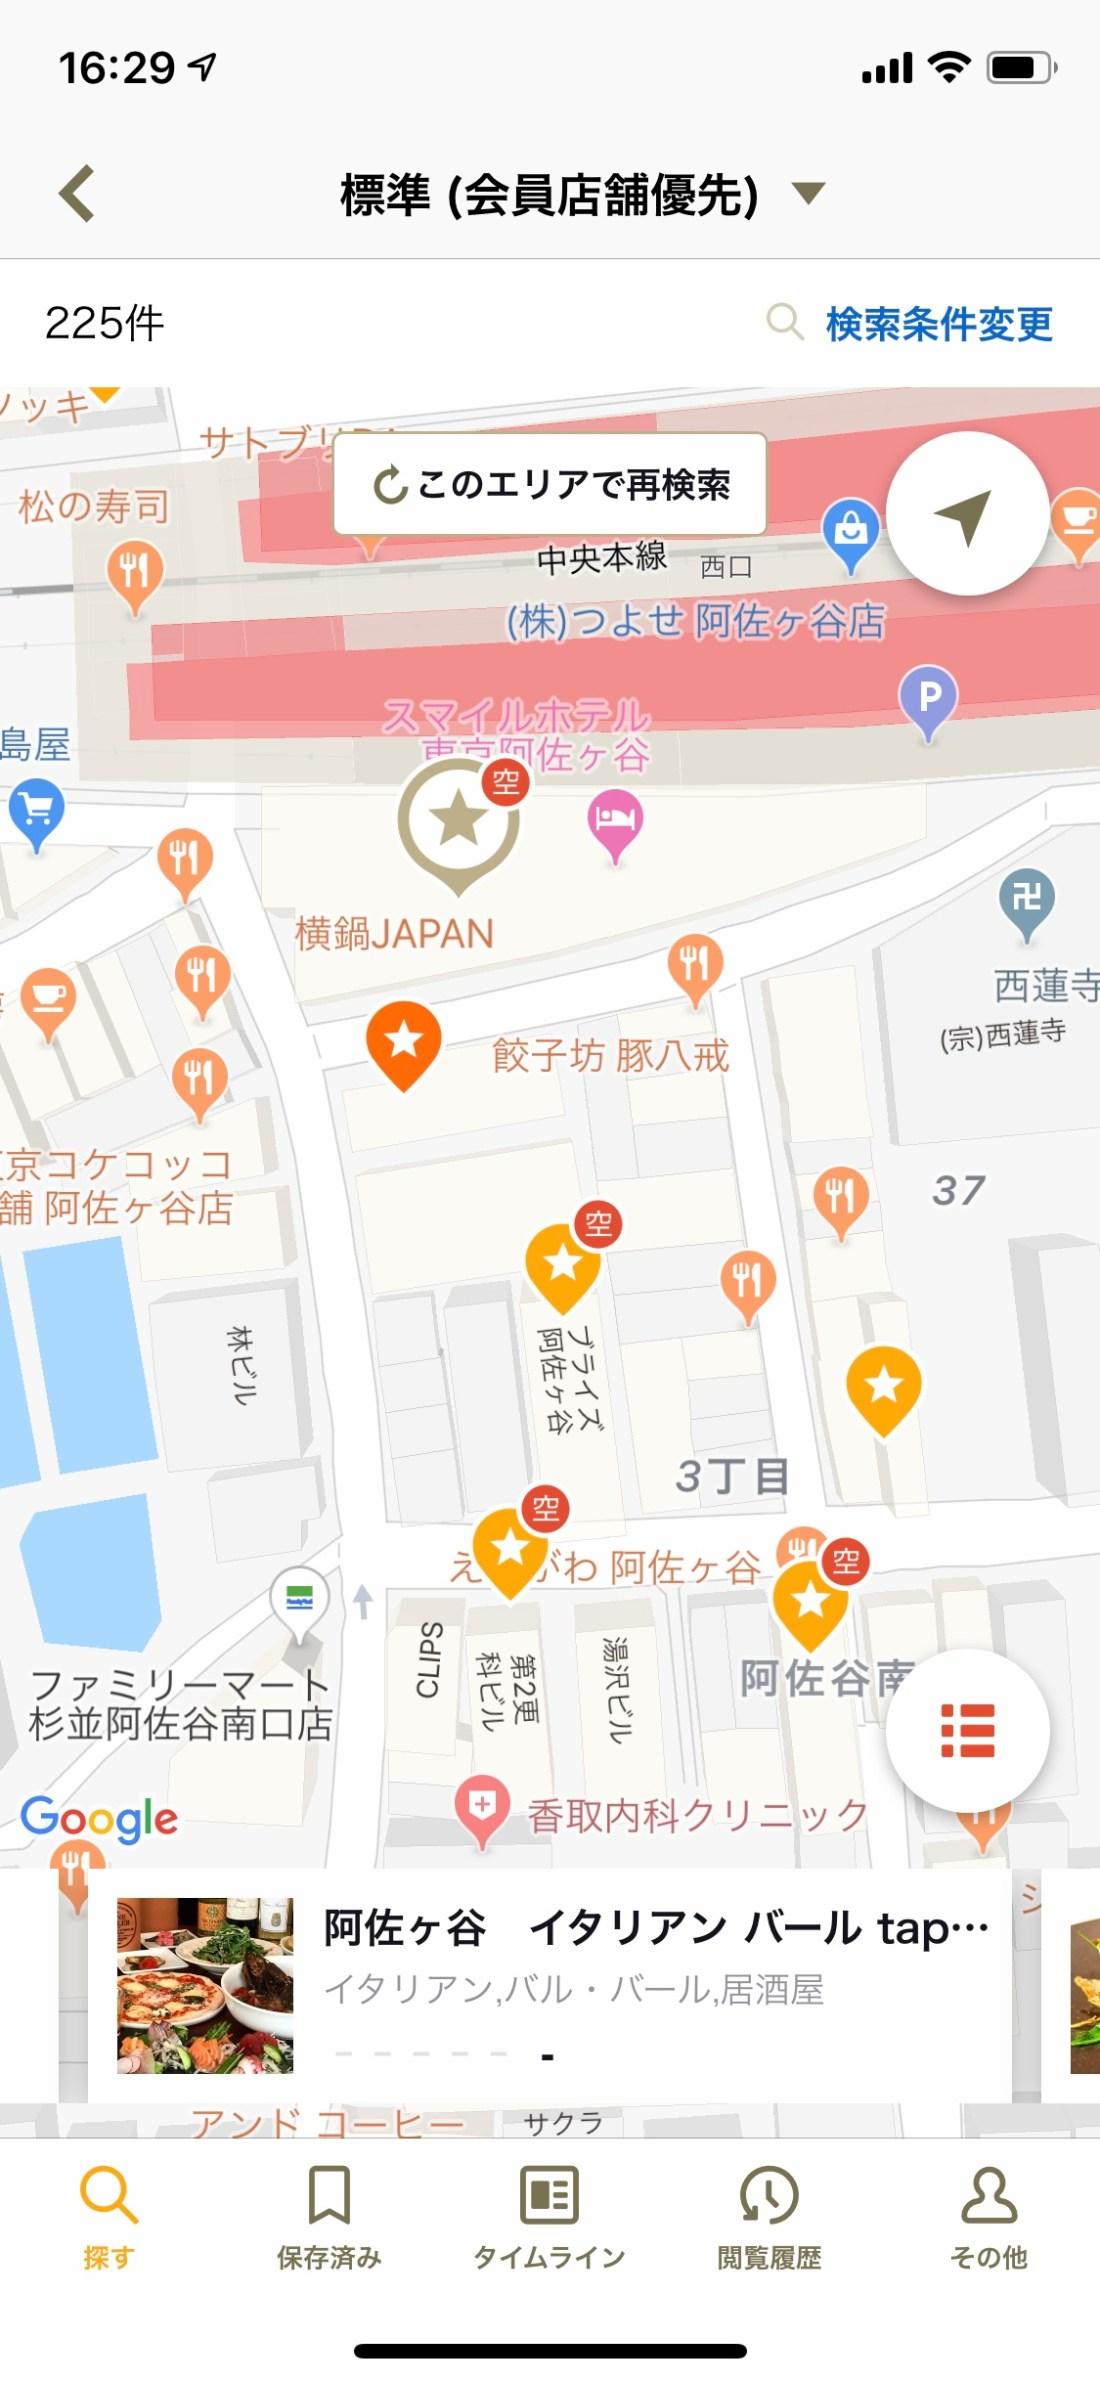 Google Maps in Tabelog